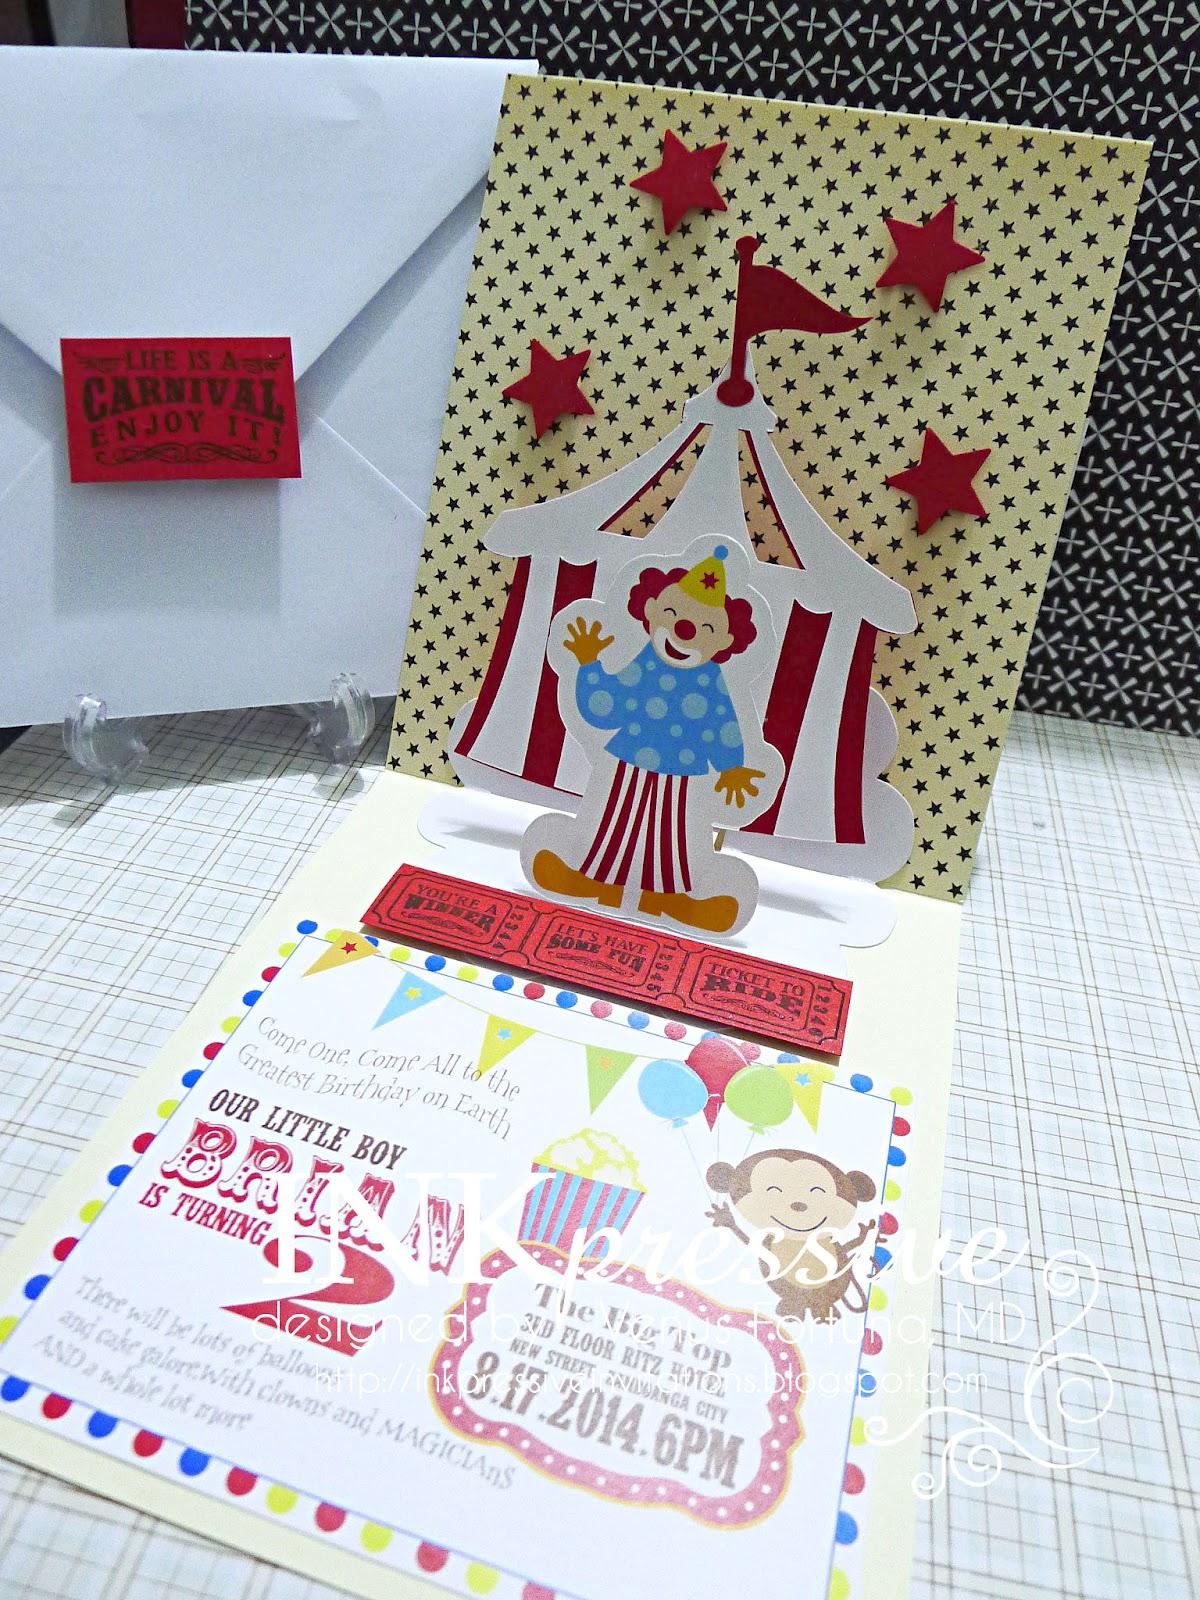 Big top circus pop up invite inkpressive invitations big top circus pop up invite stopboris Image collections